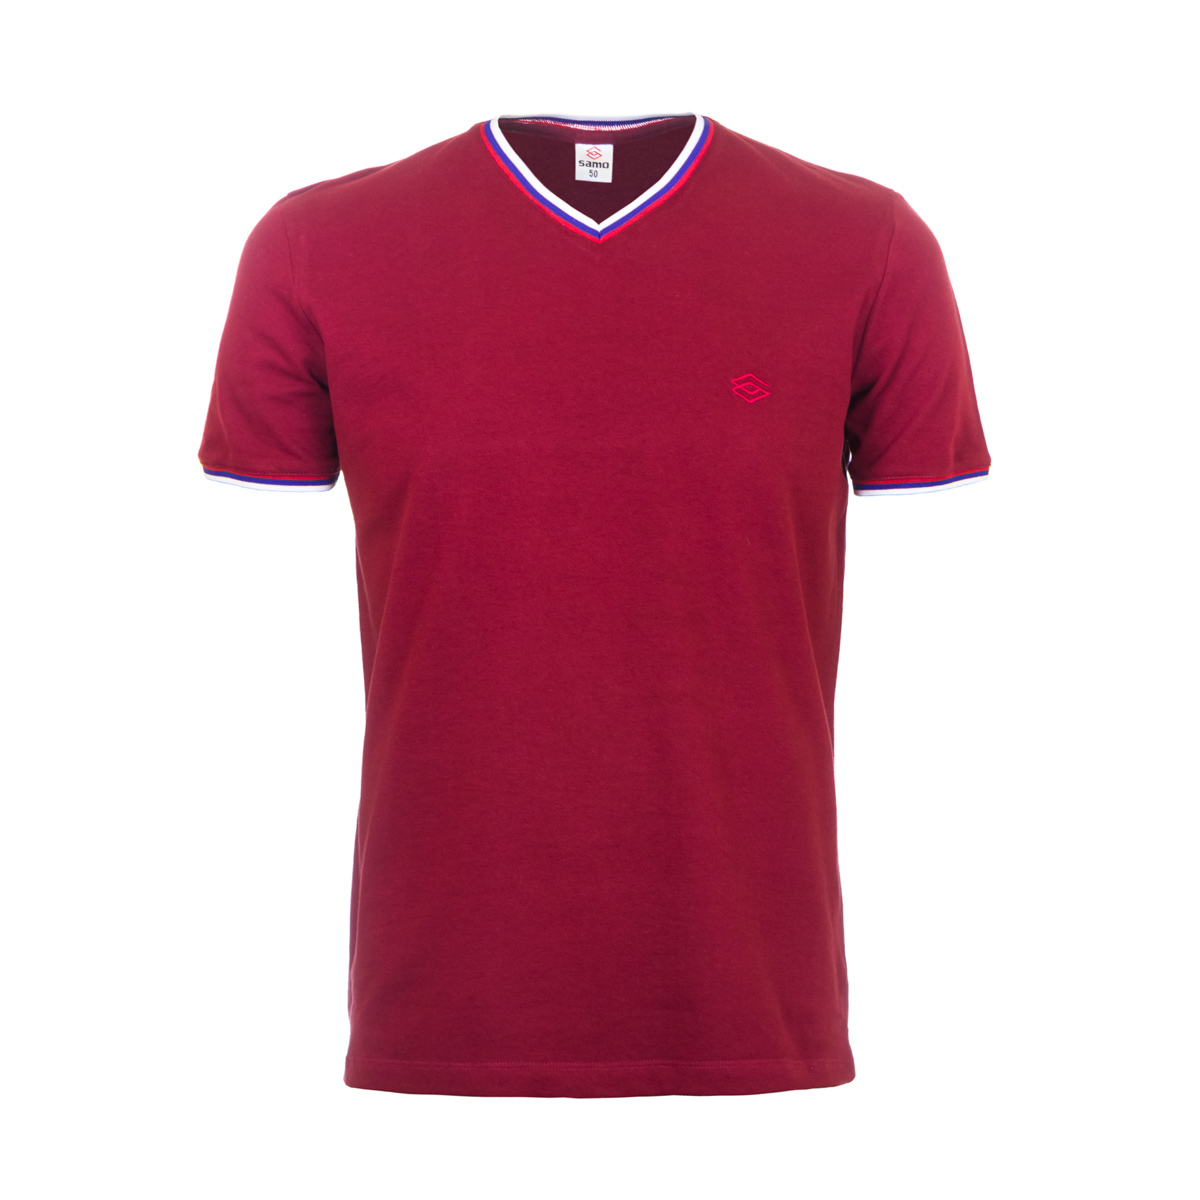 Муж. футболка арт. 04-0059 Красный р. 56 Узбекистан